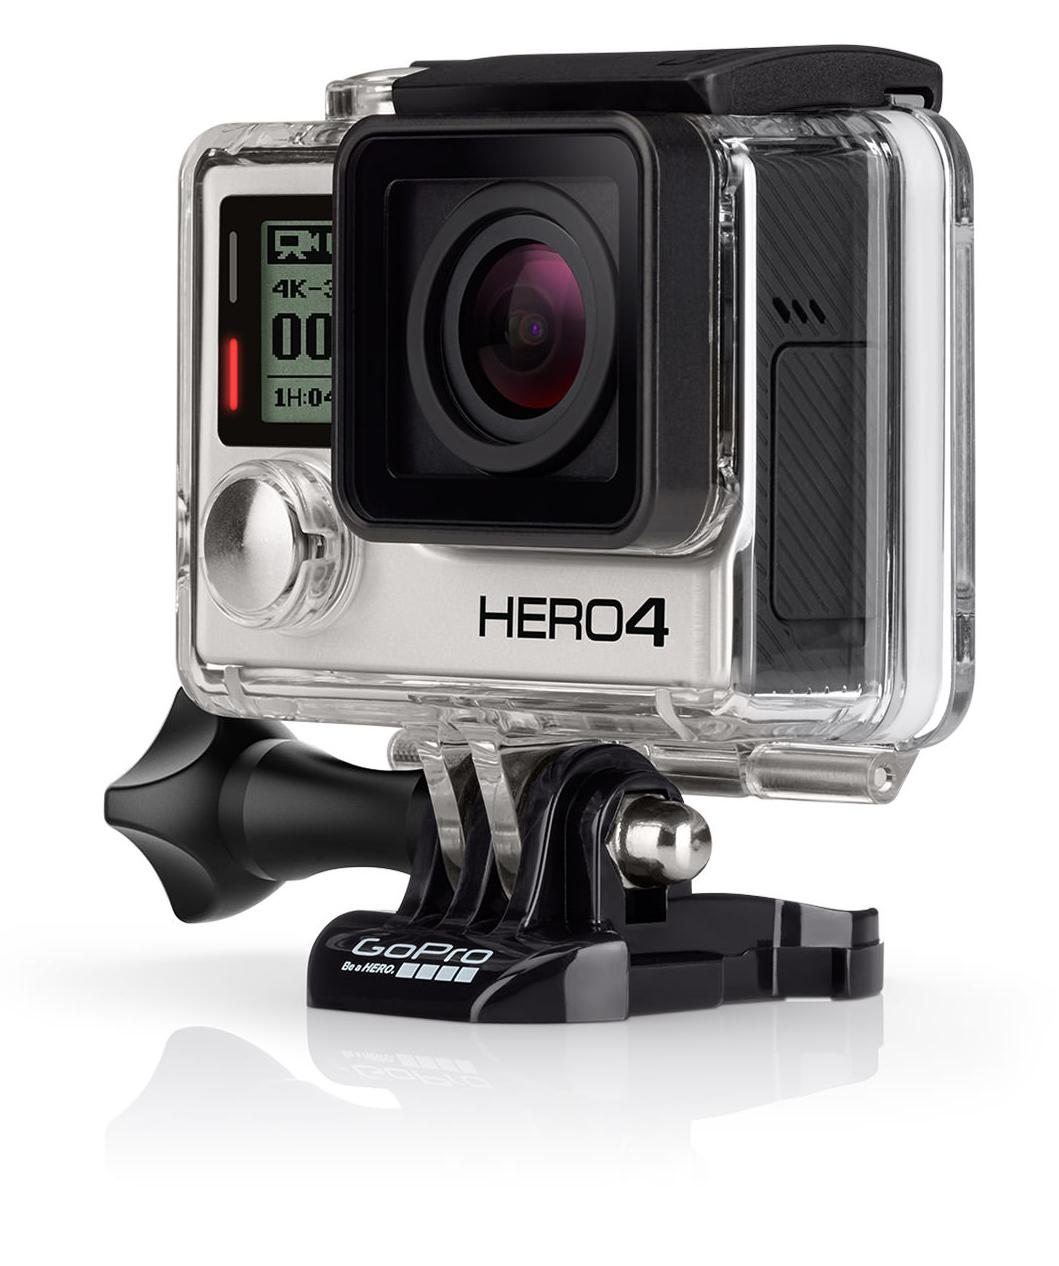 4K Ultra HD Waterproof Action Camera